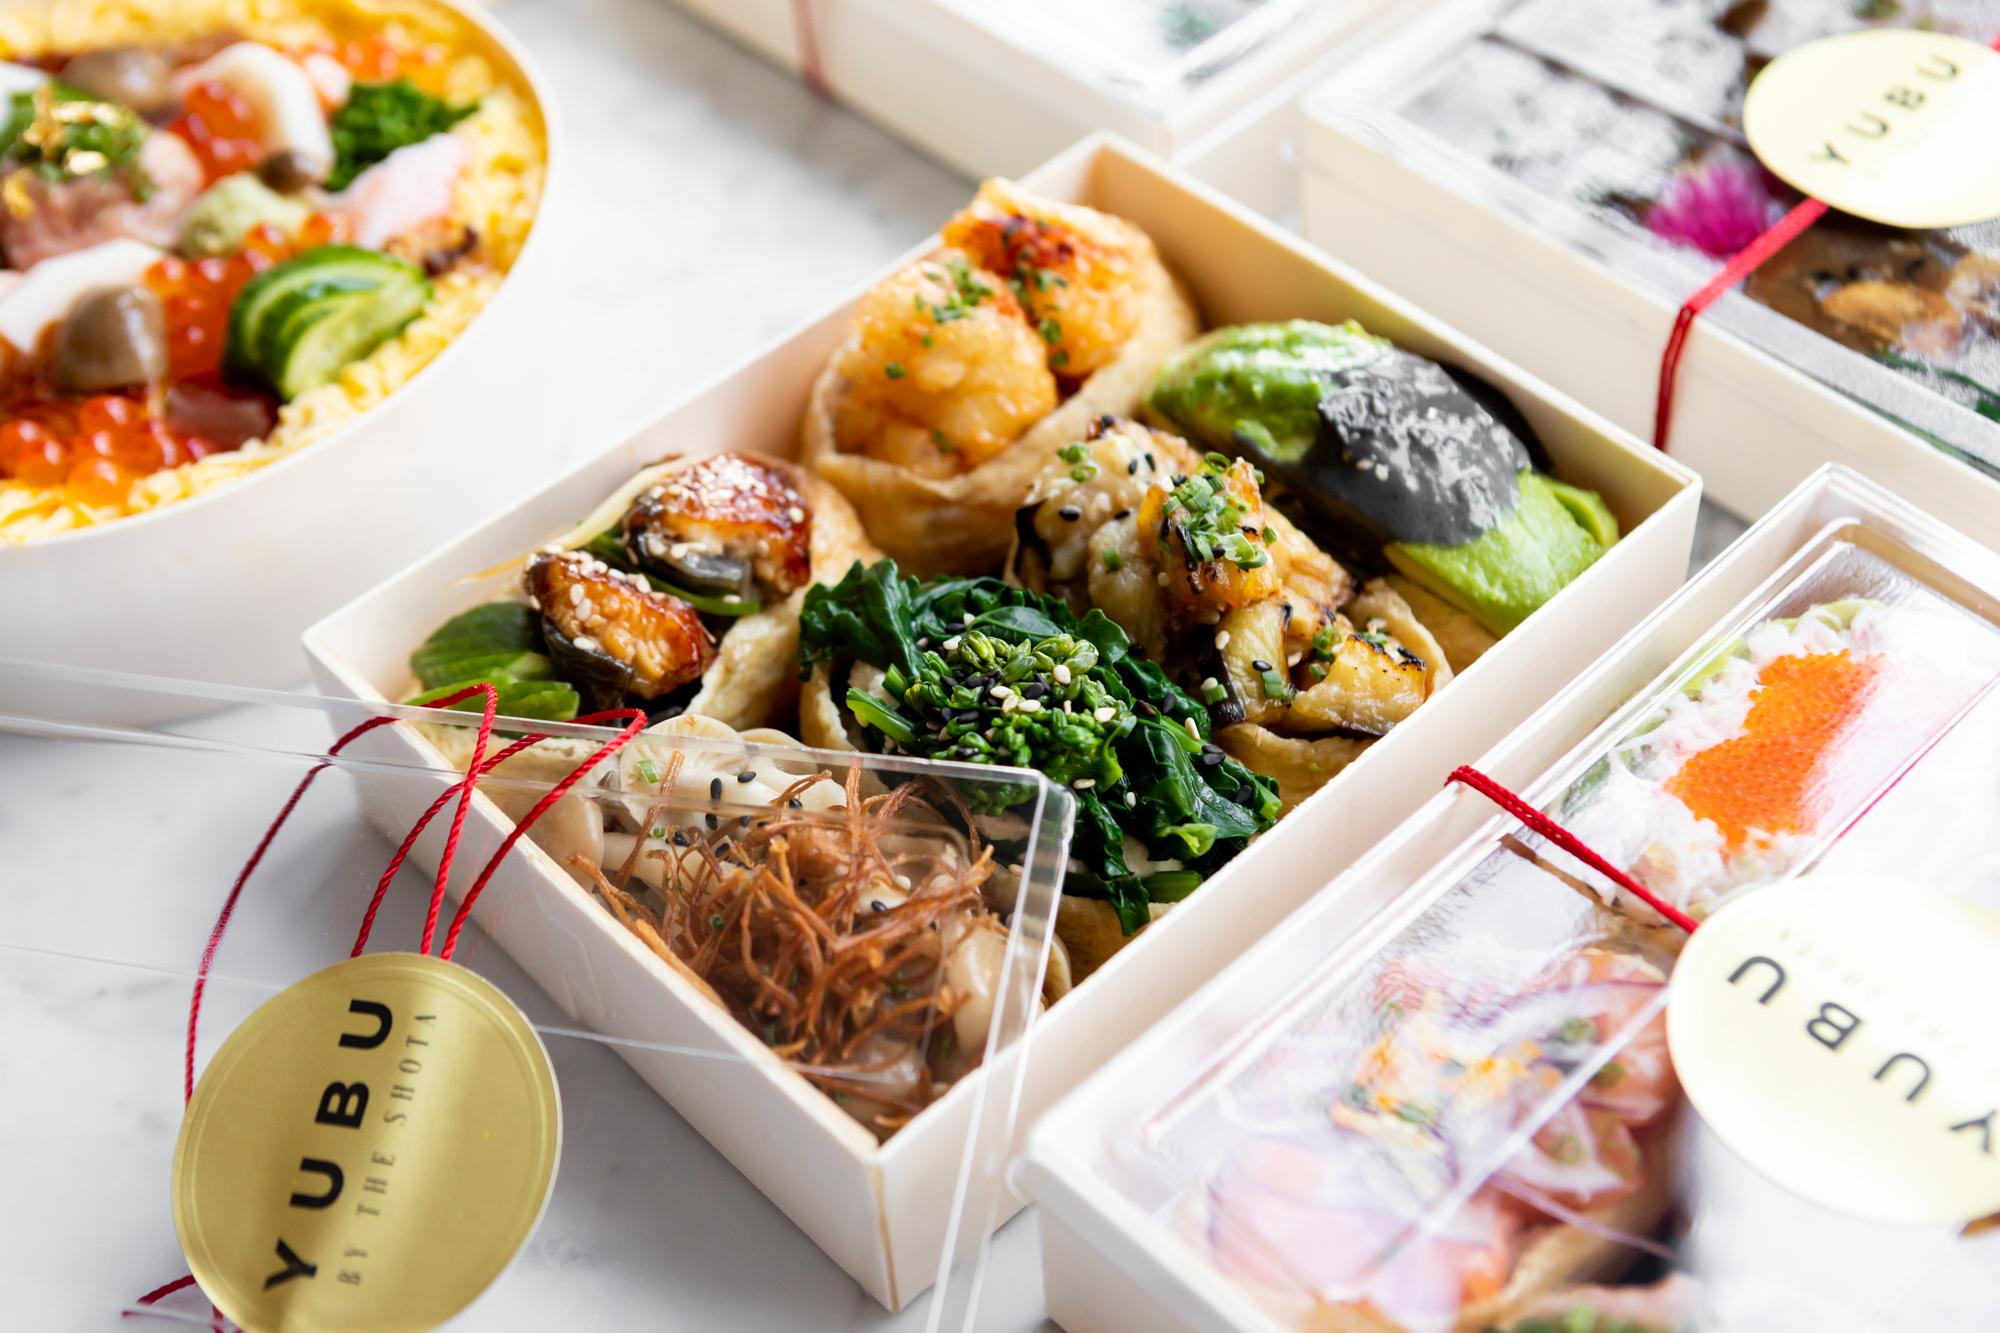 Inari sushi from Yubu by the Shota